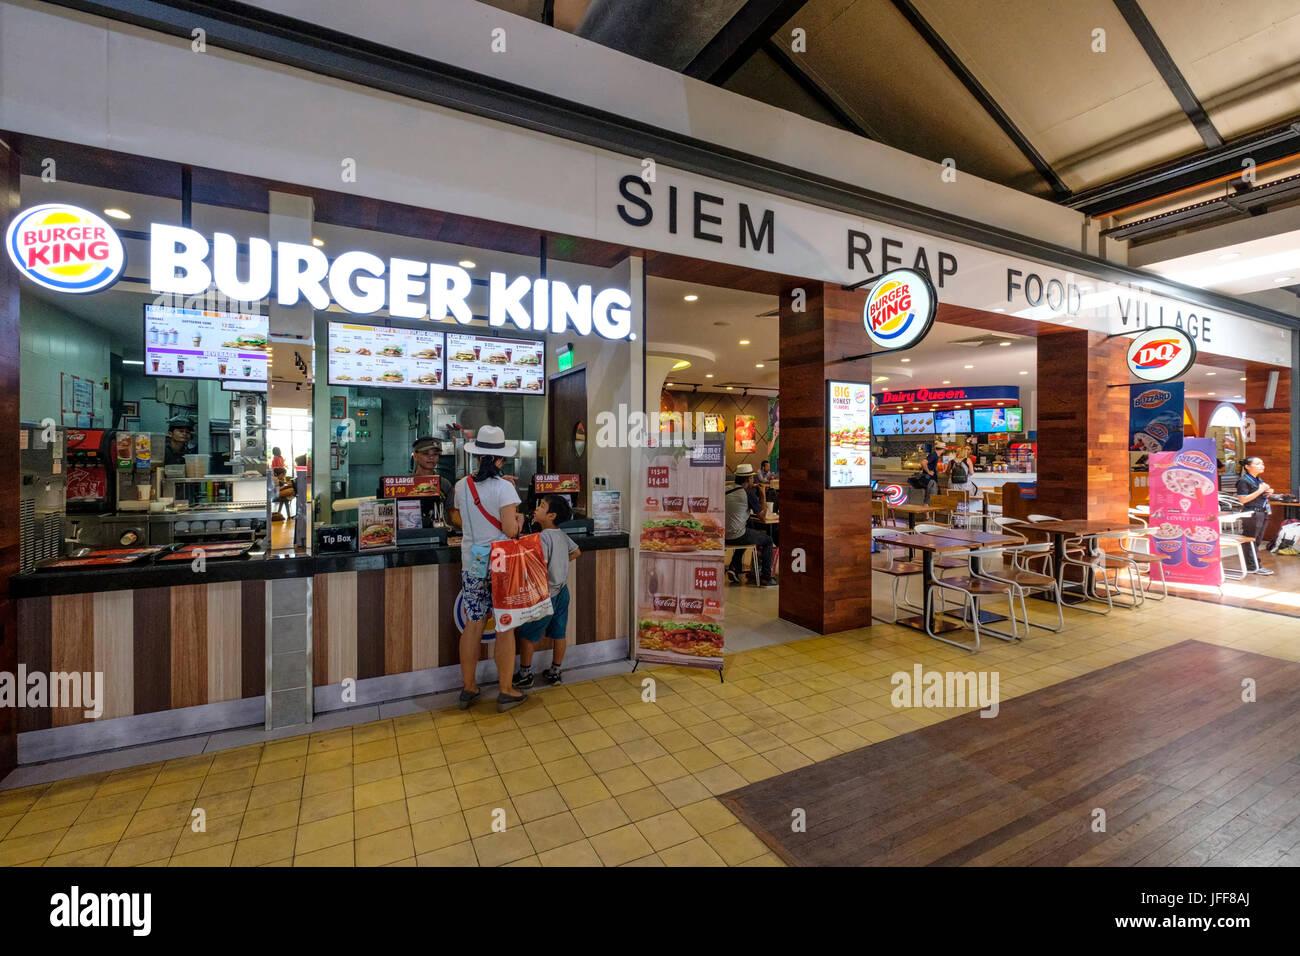 Burger King restaurant at the Siem Reap International Airport, Cambodia, Asia - Stock Image